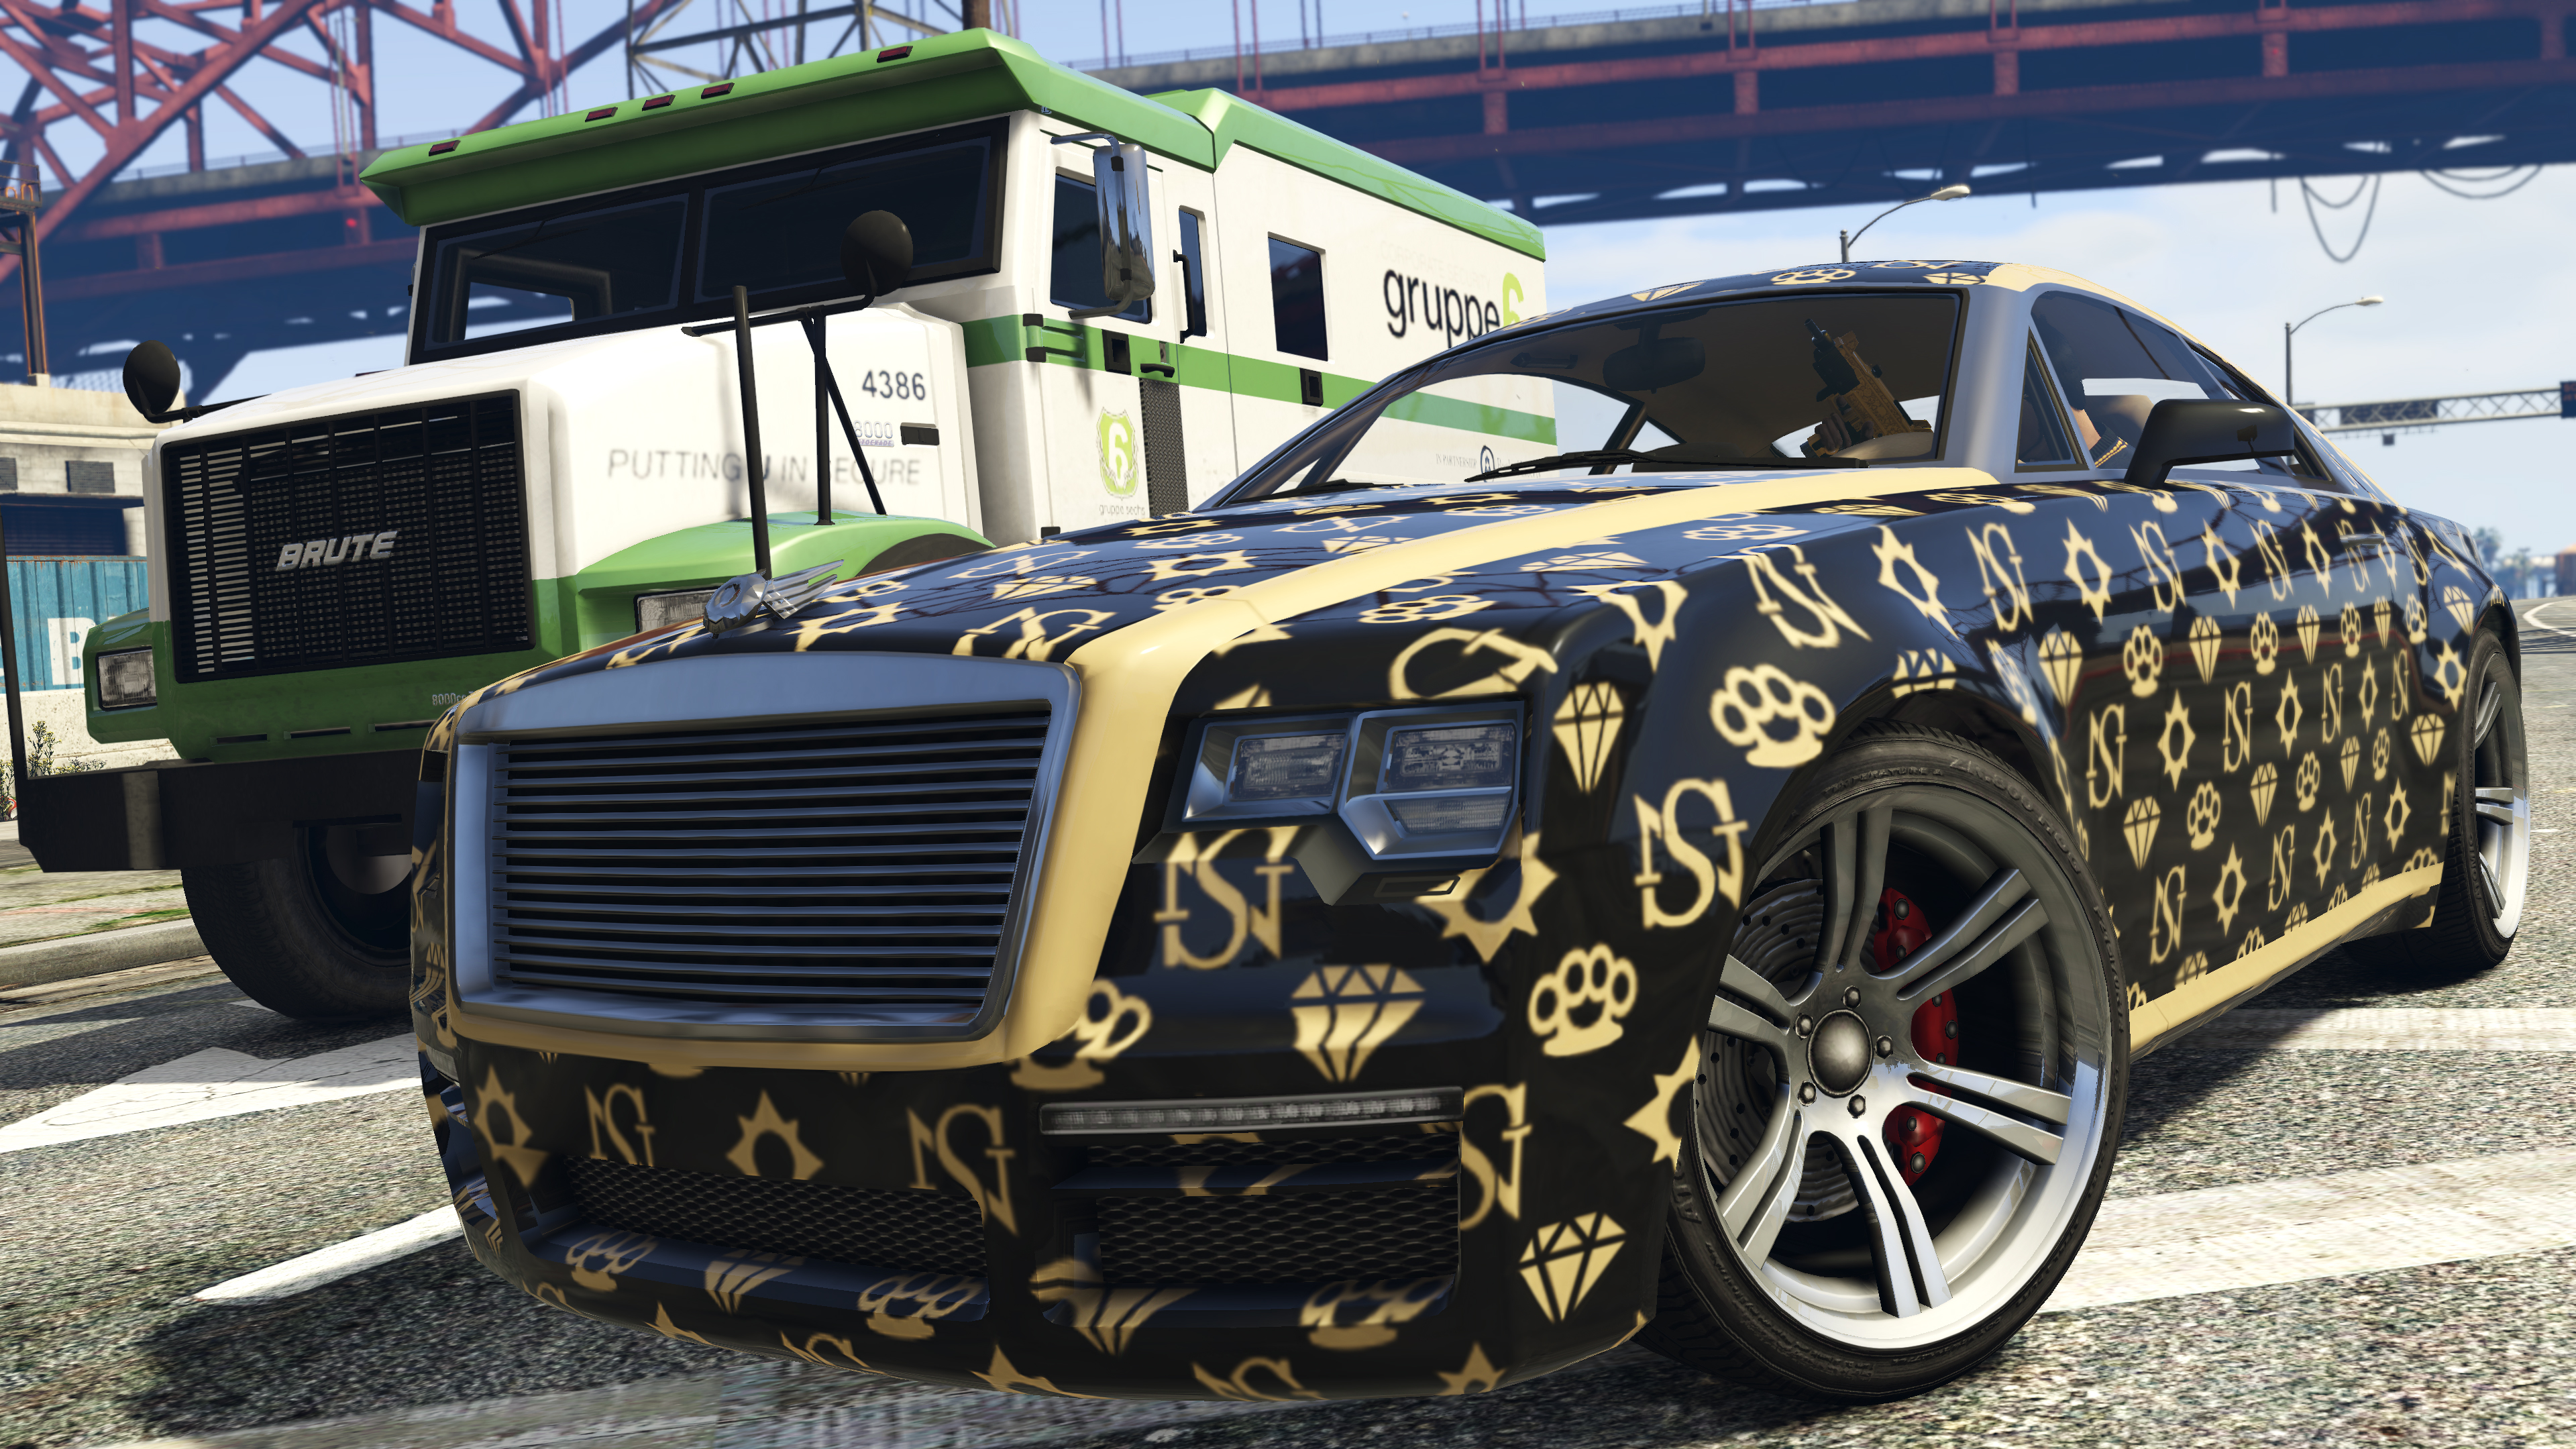 gta 5 new car releaseNew Update for Grand Theft Auto Online Coming Next Week  Rockstar